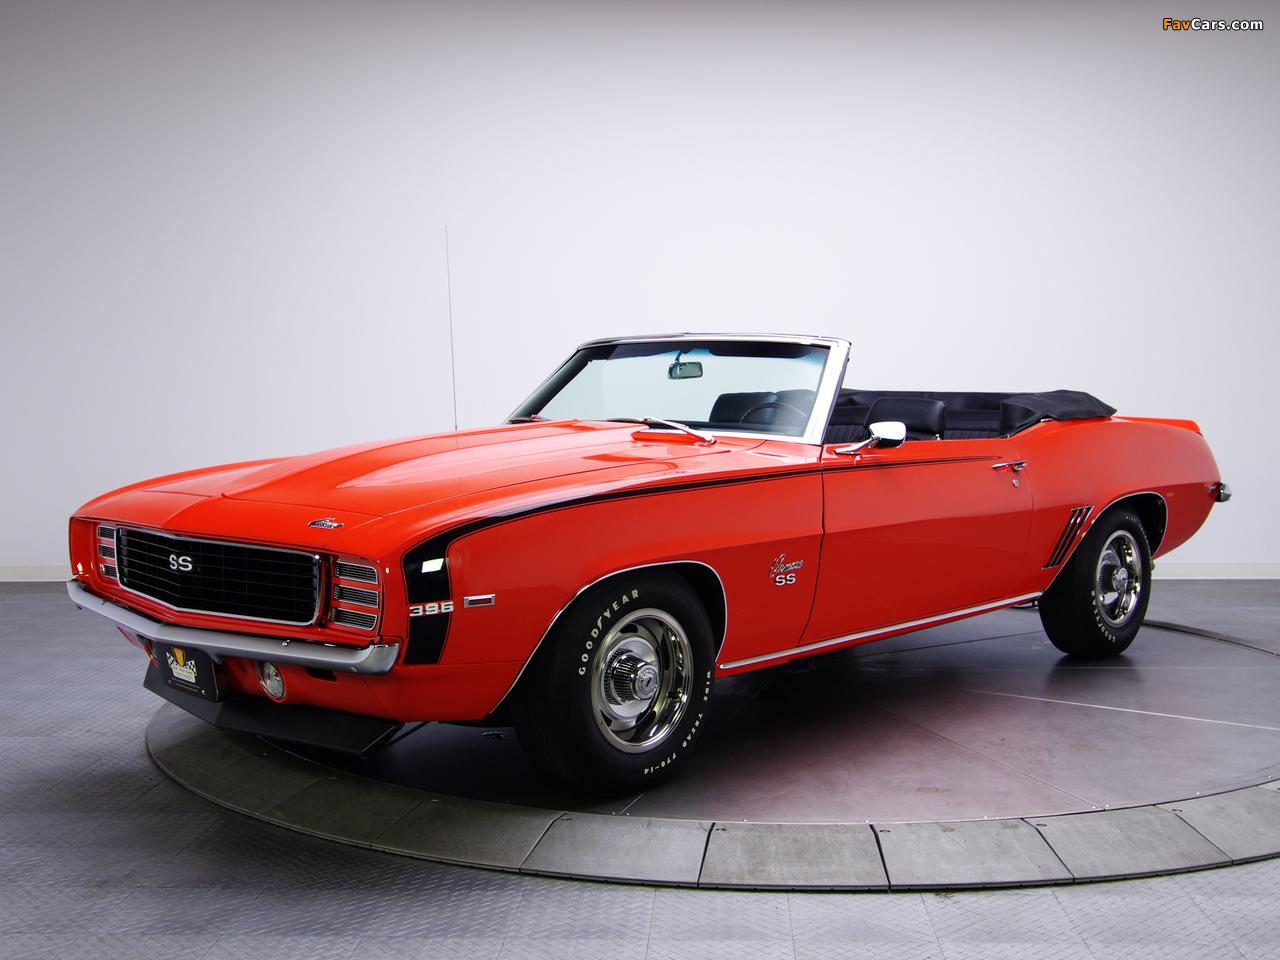 1969 Chevrolet Chevelle COPO for sale  Daniel Schmitt amp Co